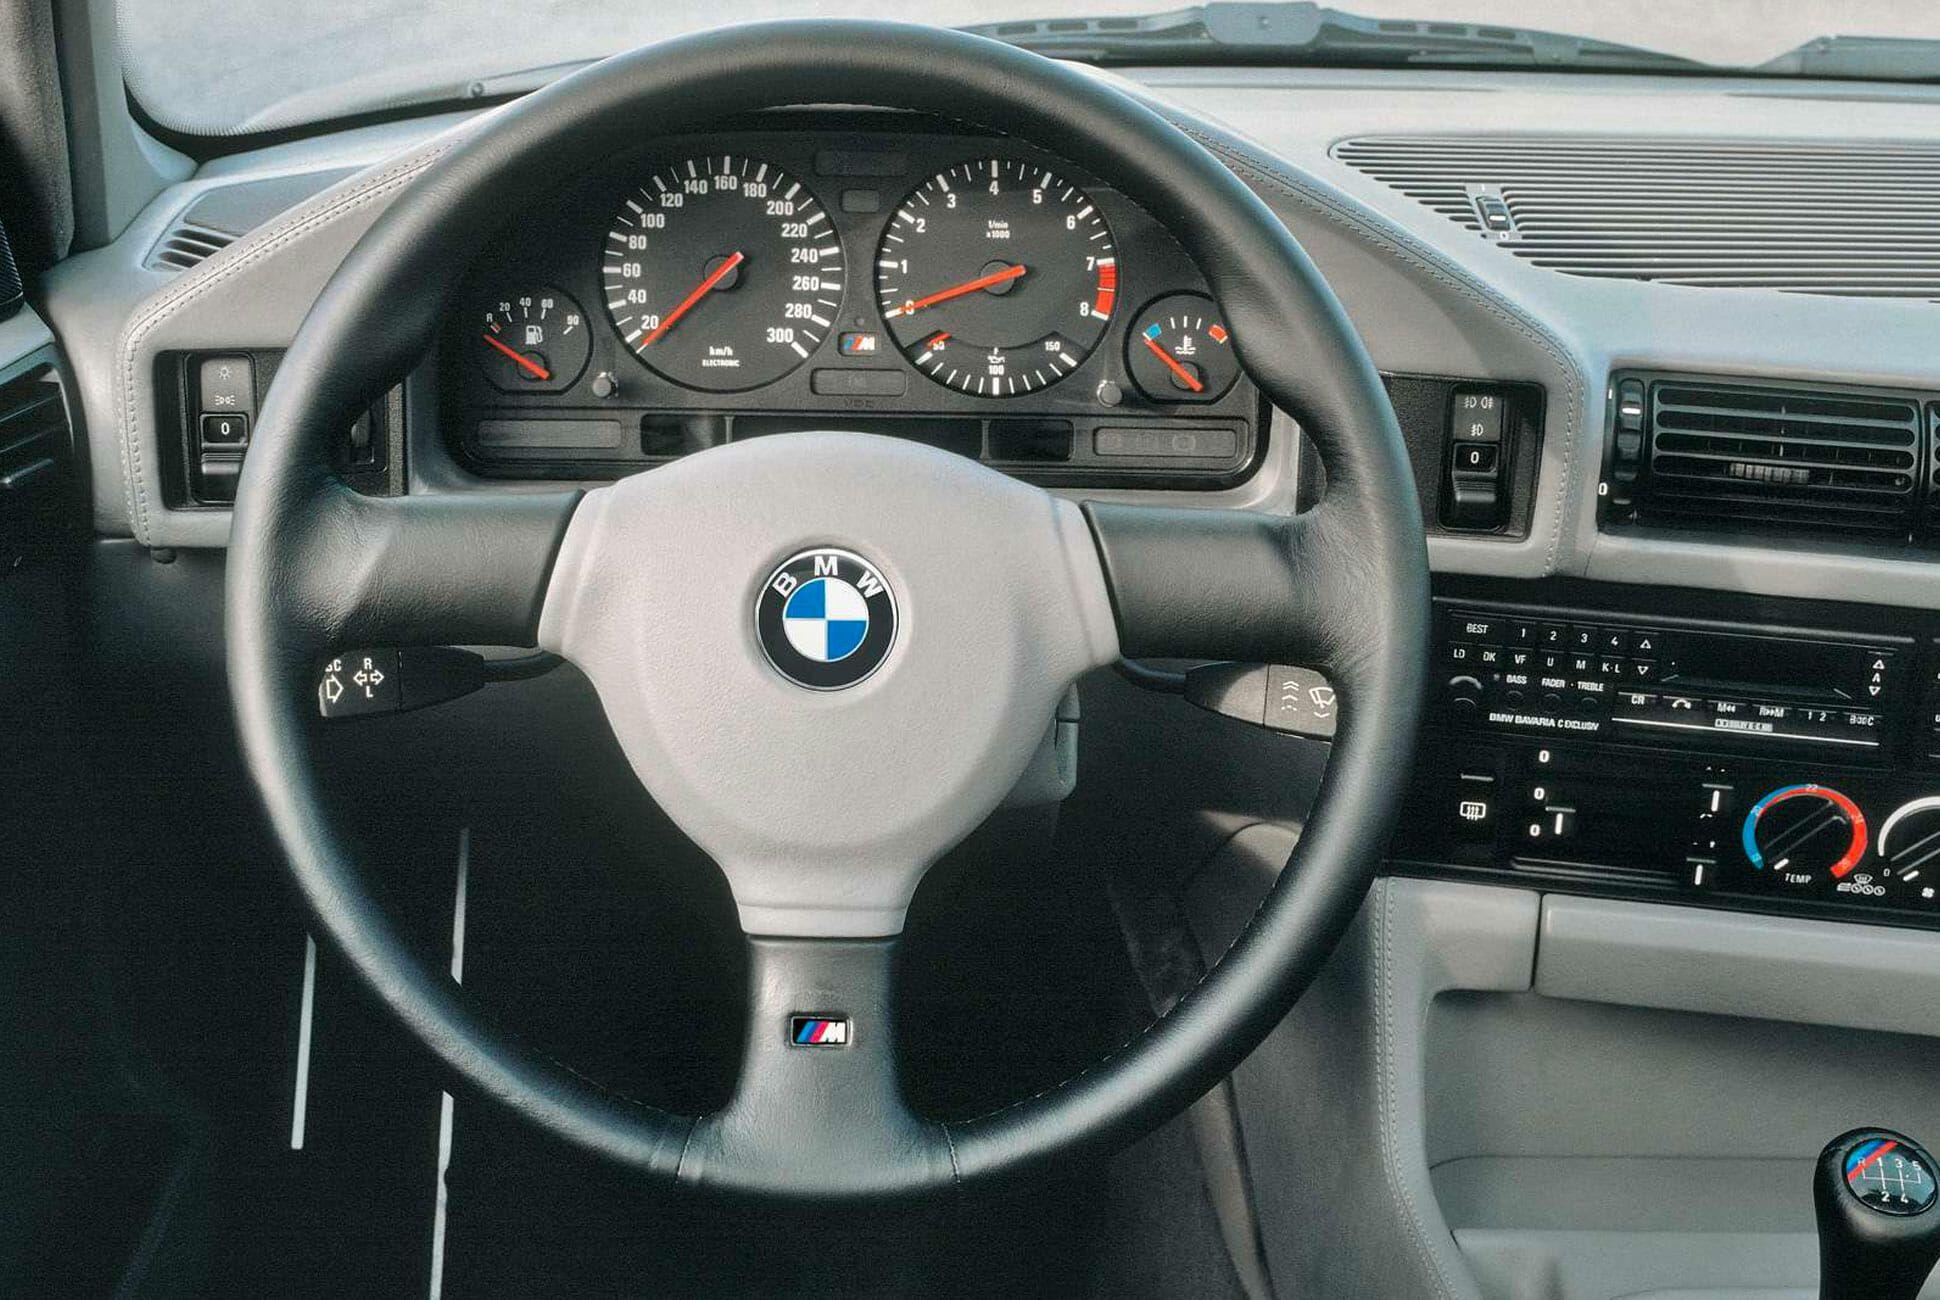 E34-BMW-M5-gear-patrol-slide-3